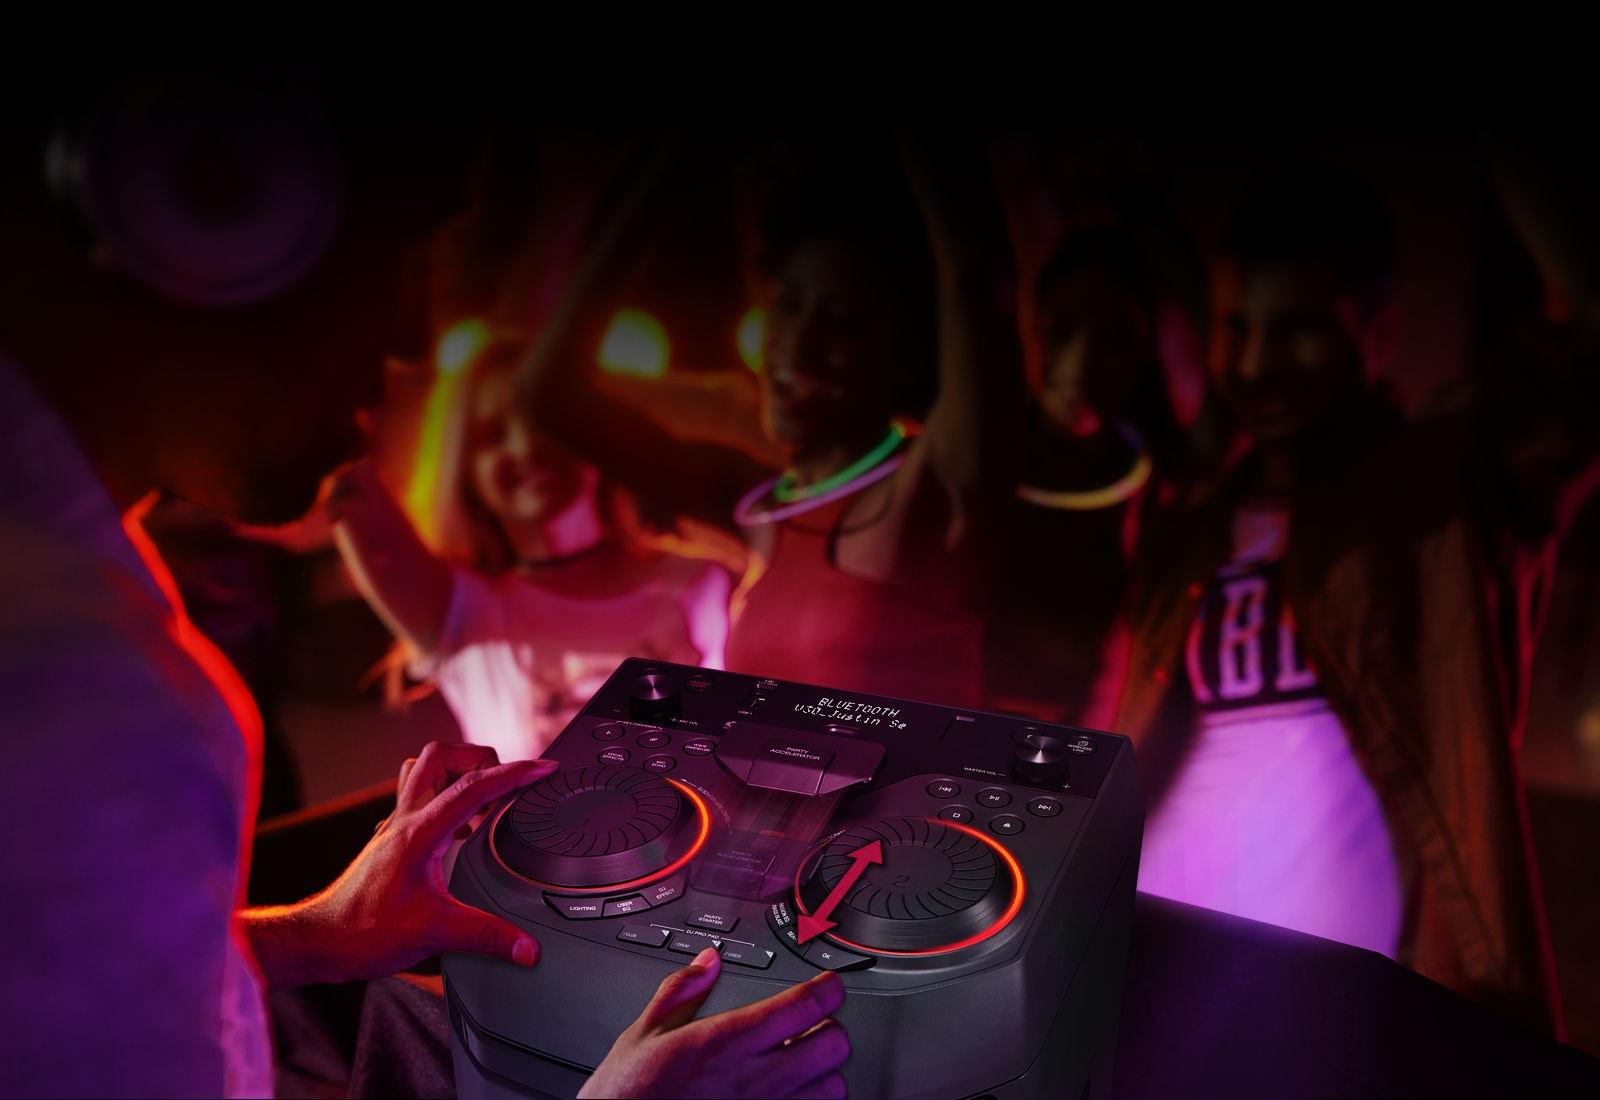 04_OK55_Accelerate_Your_Party_Desktop